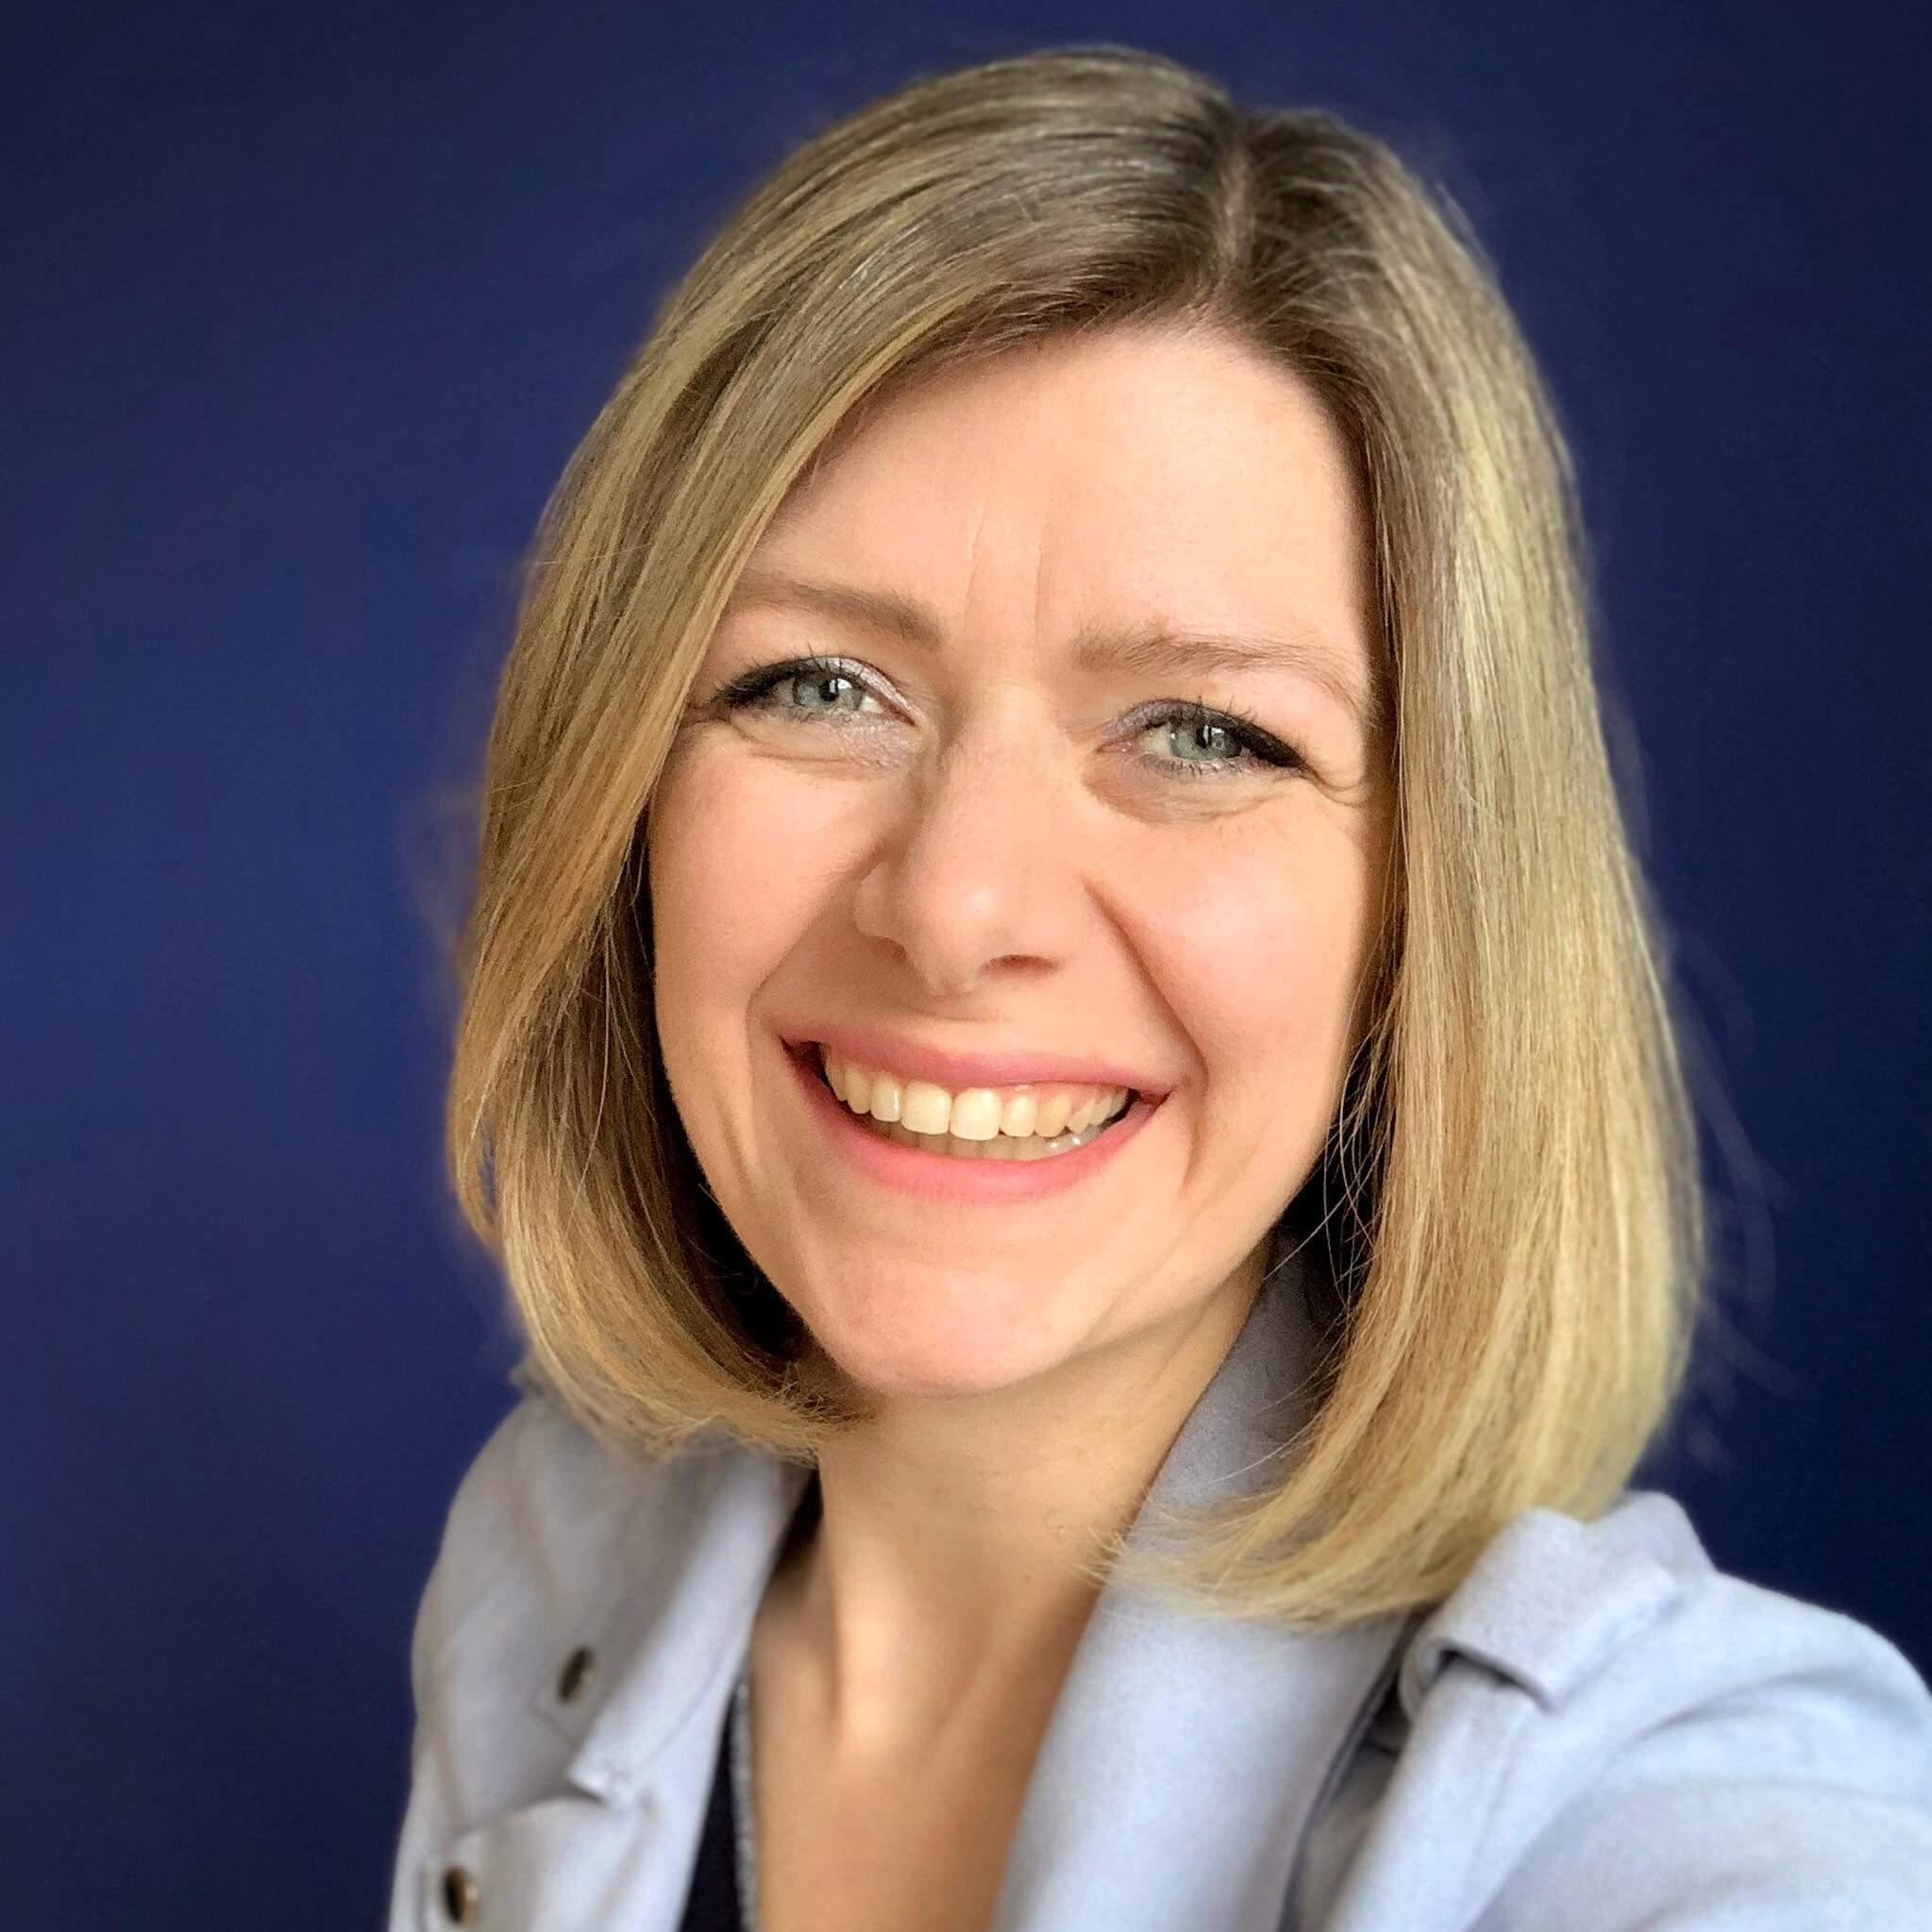 Marieke Vogelzang